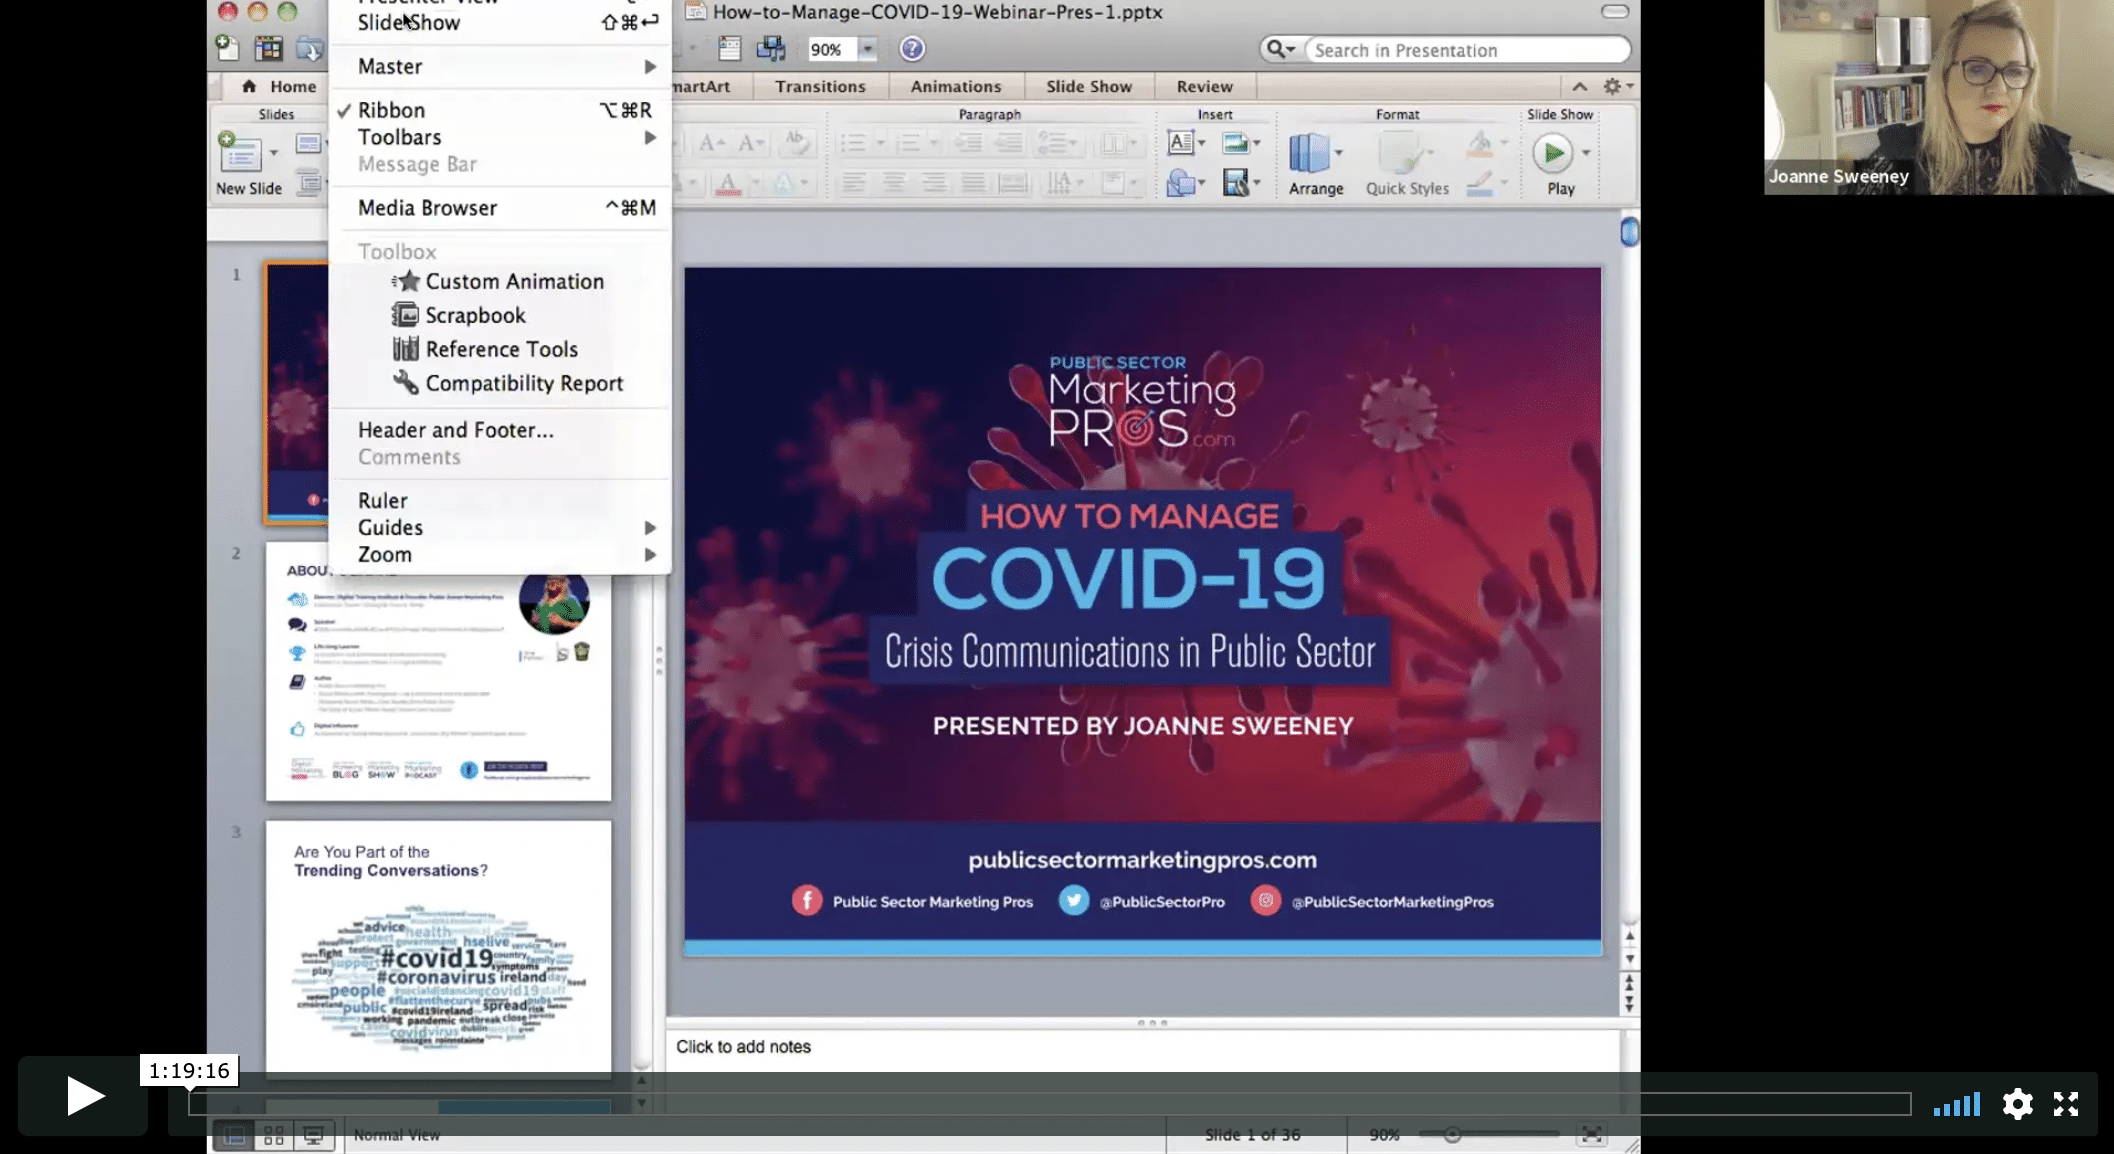 COVID-19 Crisis Comms Webinar Screenshot